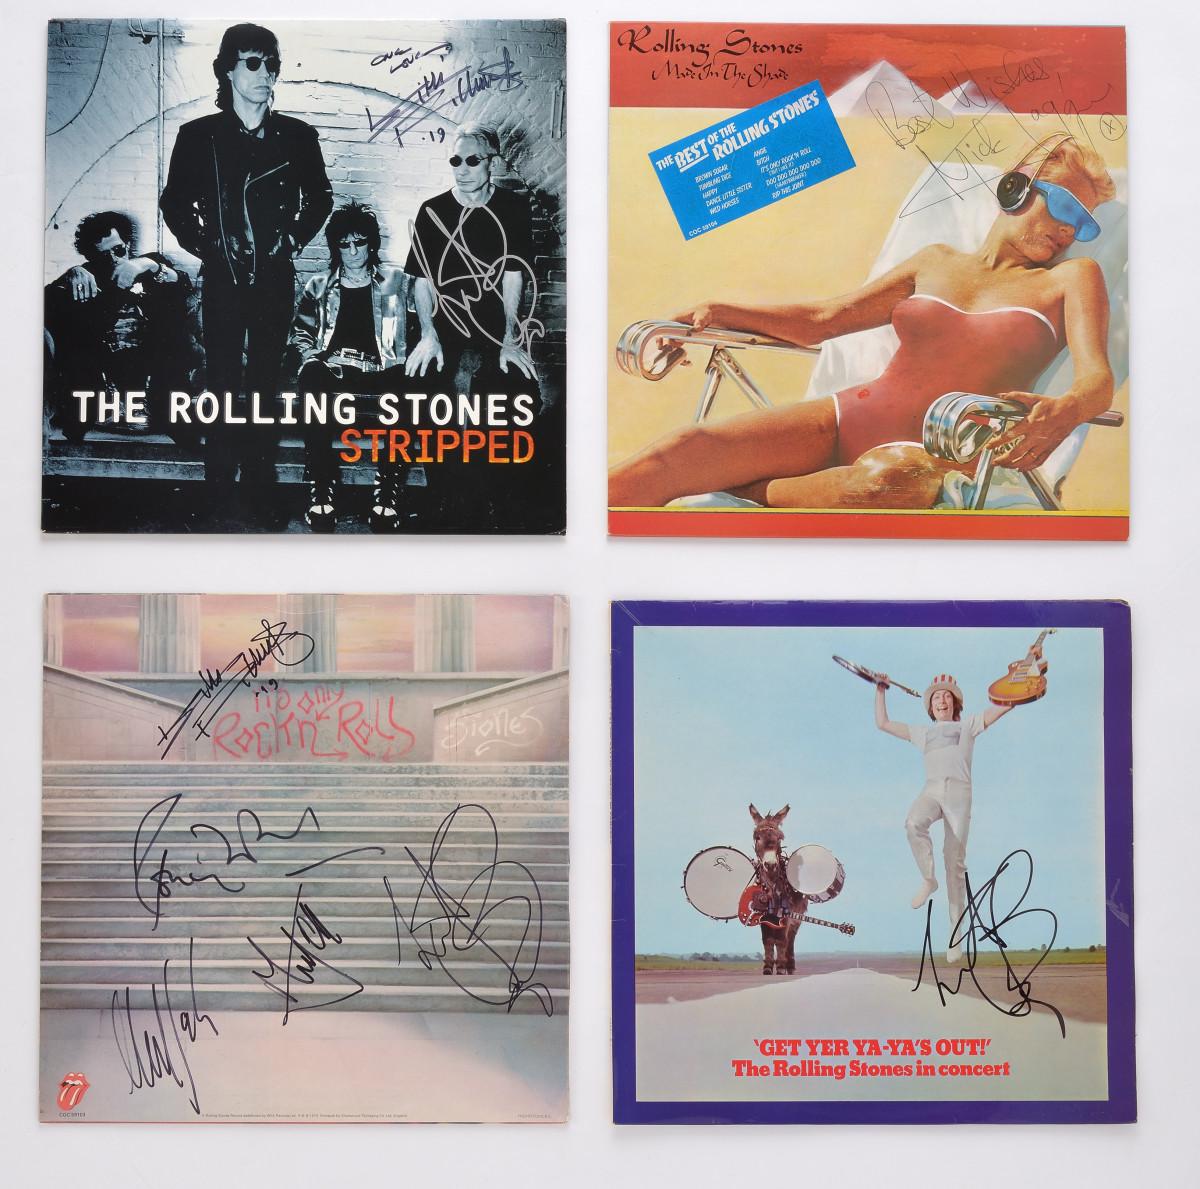 Various autographed Stones albums